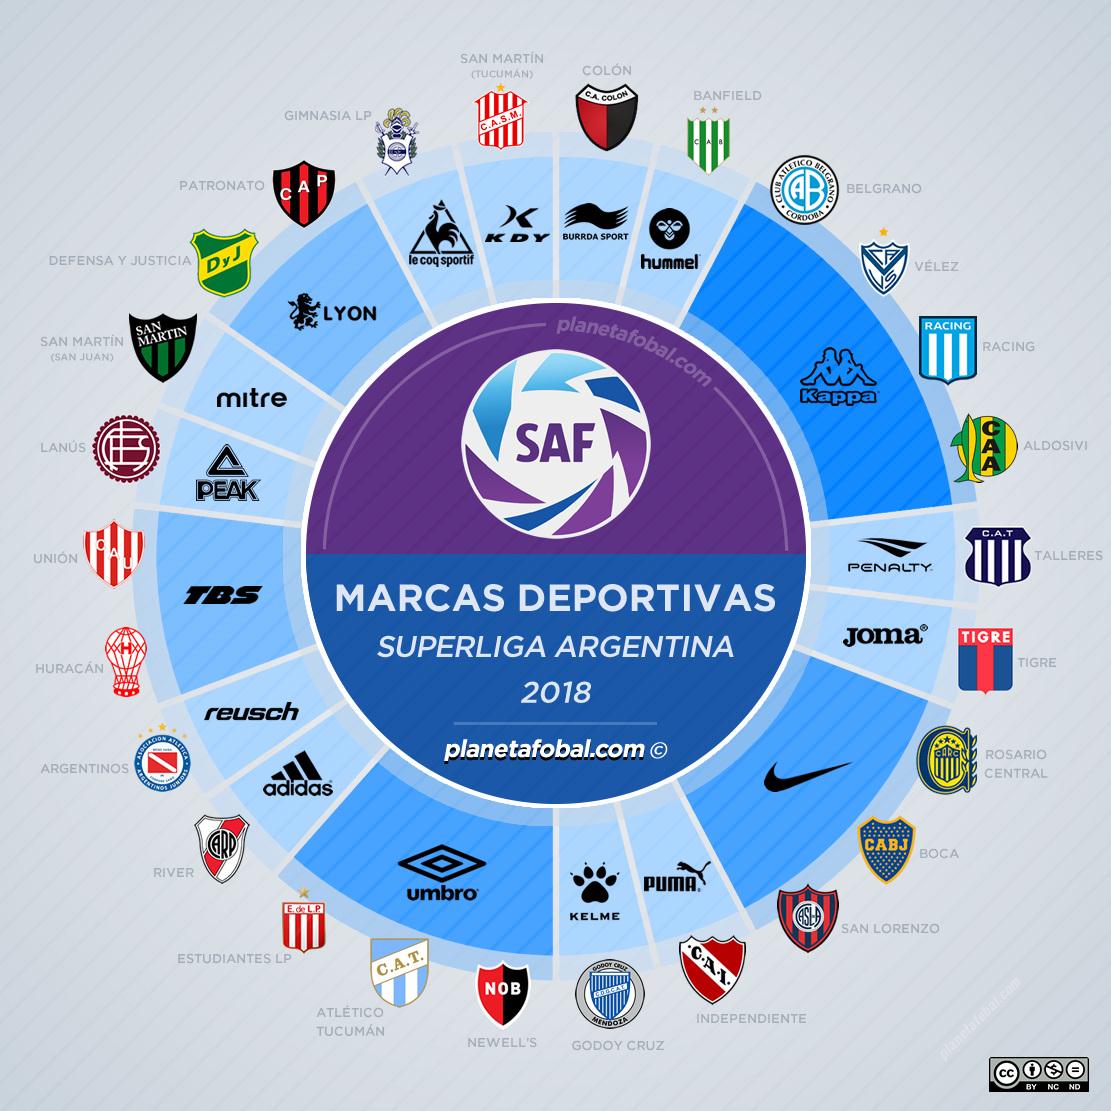 As fabricantes esportivas no Campeonato Argentino 2018 19 - Show de ... d8810755ece26